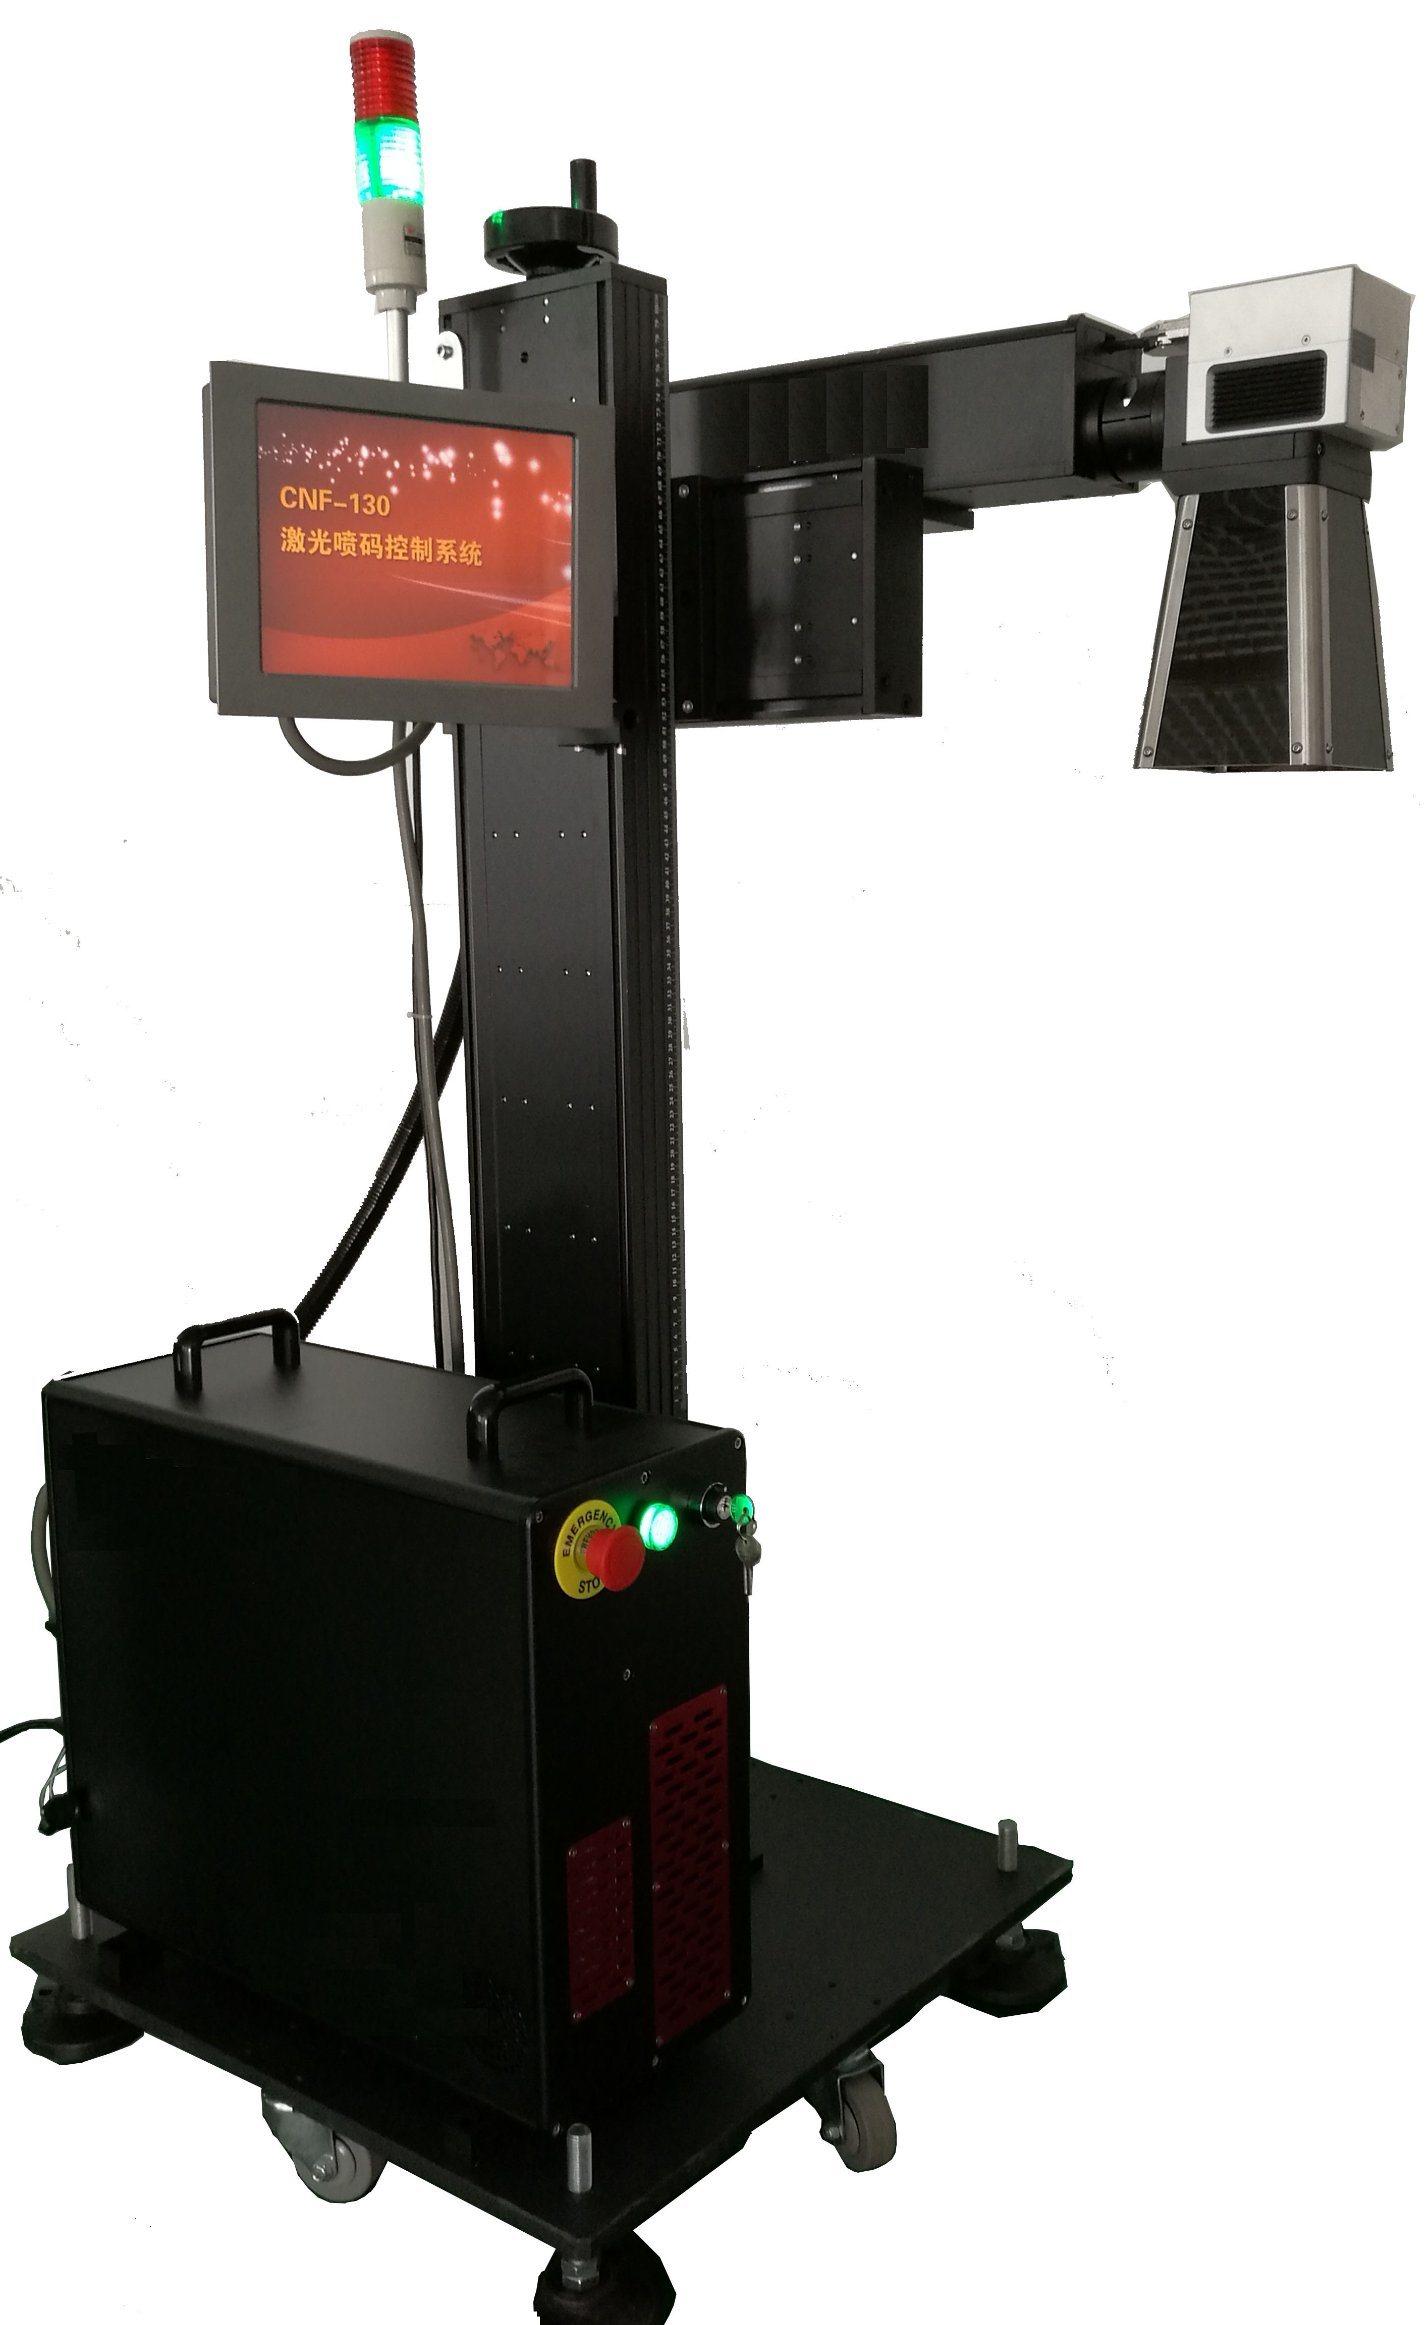 20W 30W 50W Ipg Fiber Laser Marker for Pipe, Fittings, PVC/HDP/PE/CPVC/UPVC Plastic Non-Metal